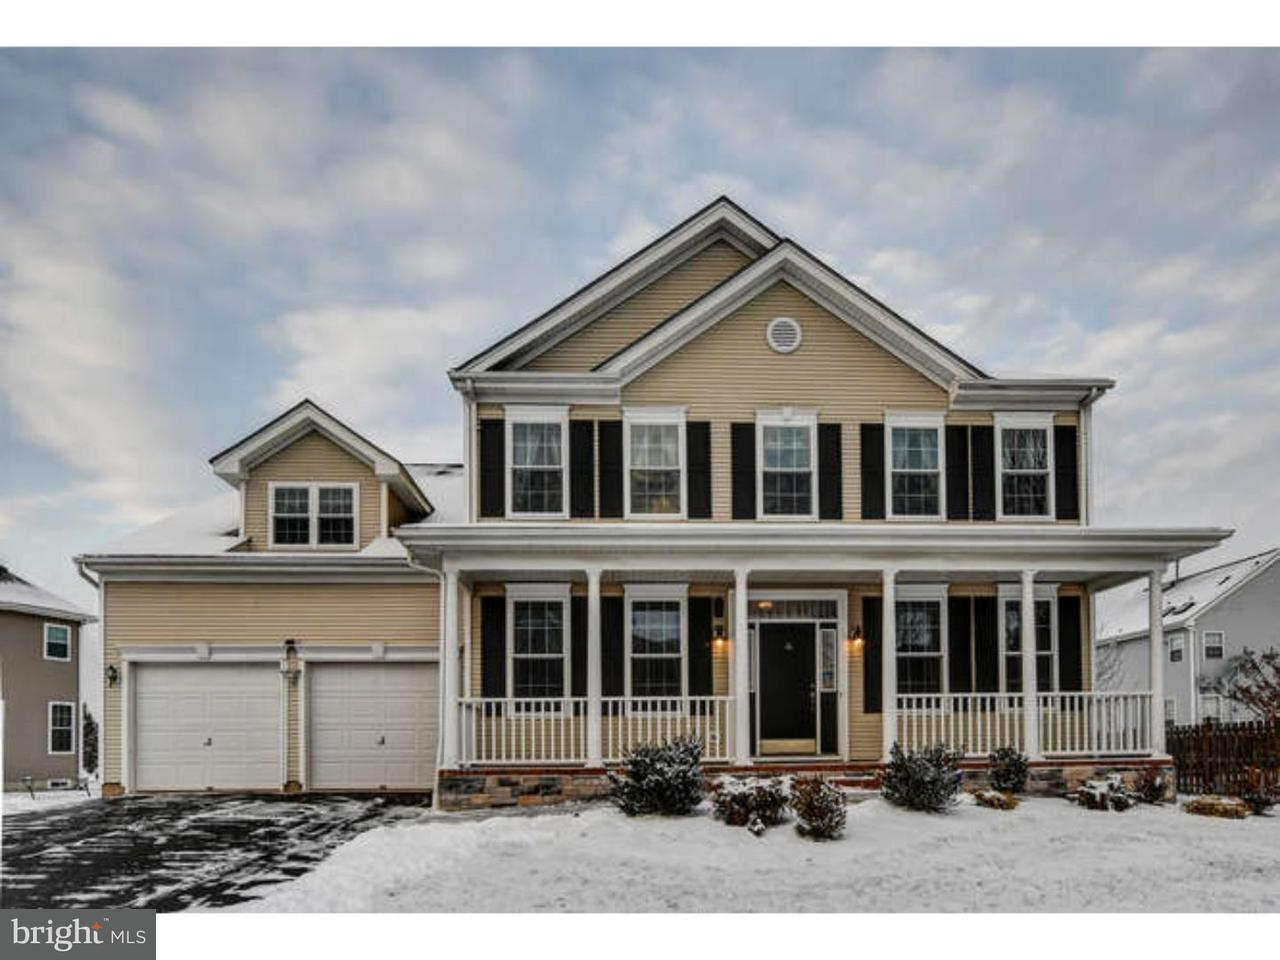 Single Family Home for Sale at 16 DOGWOOD Drive Plainsboro, New Jersey 08536 United StatesMunicipality: Plainsboro Township